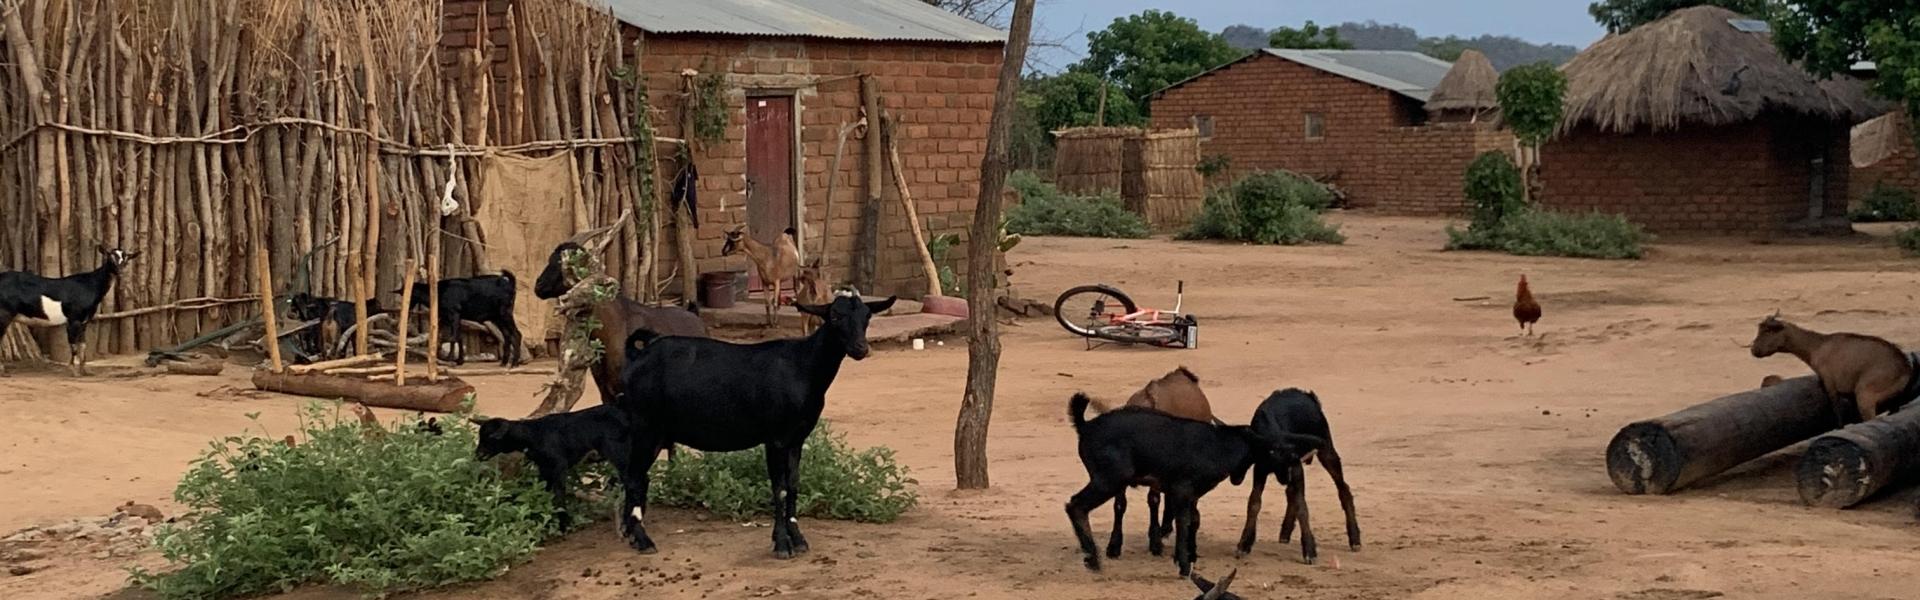 Goats on a rural farm